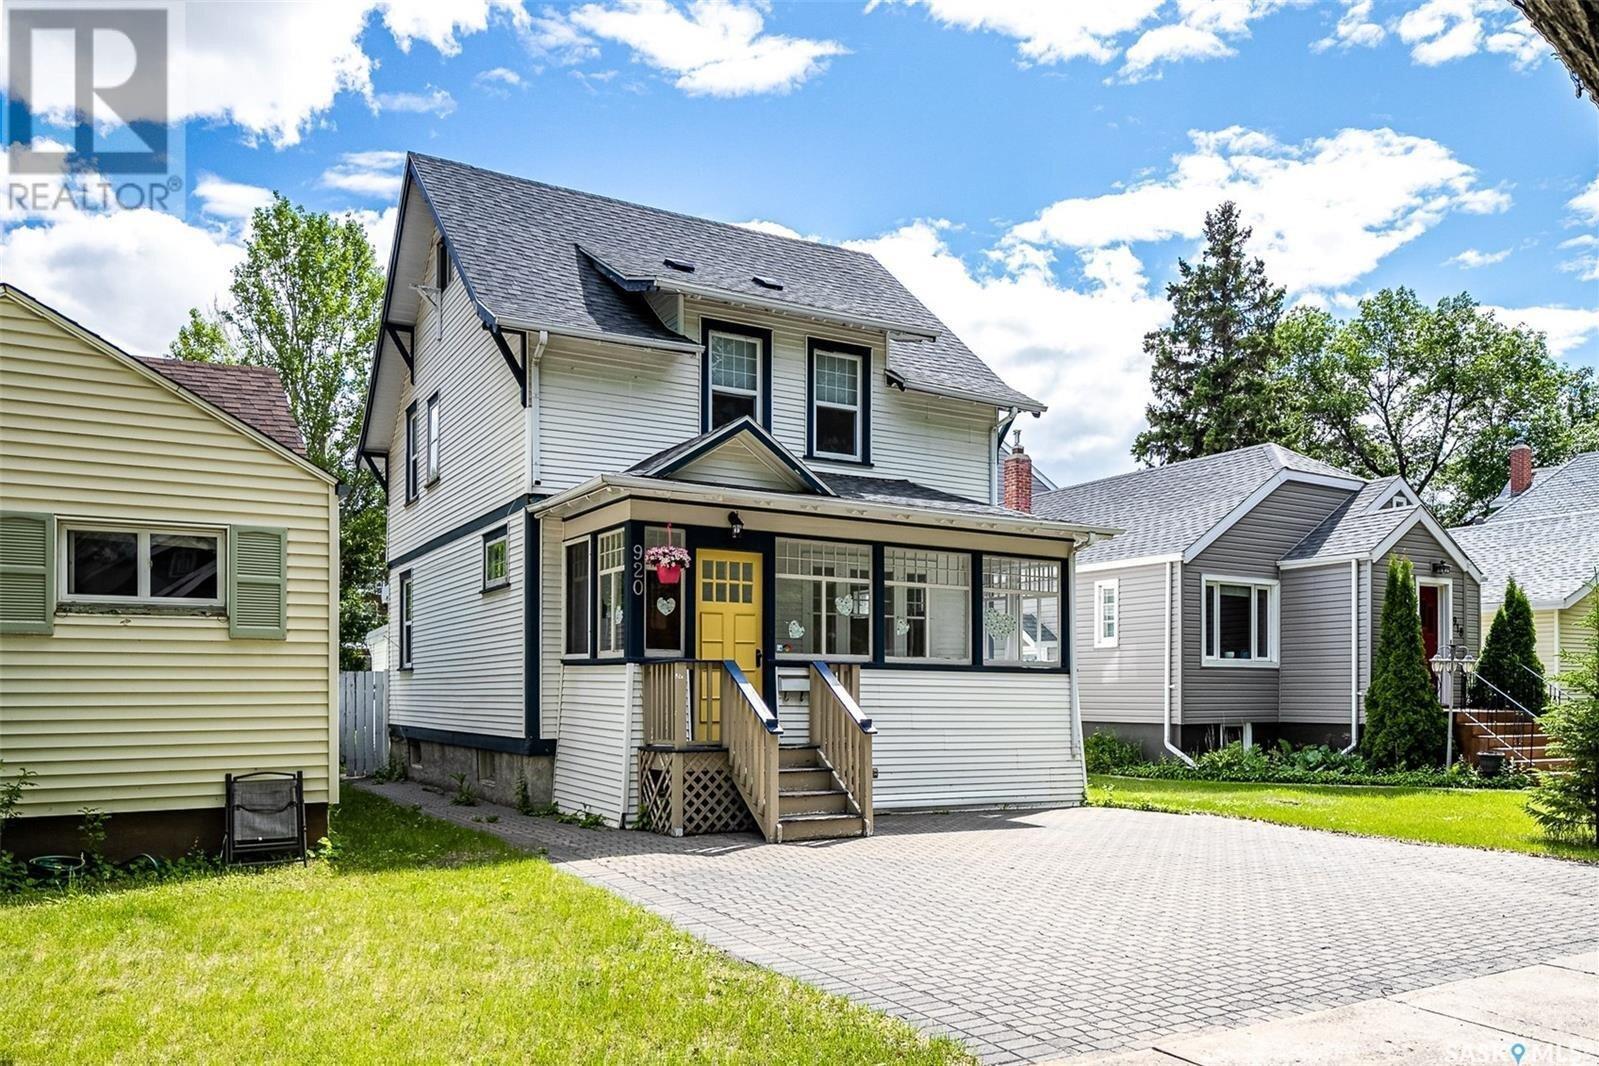 House for sale at 920 10th St E Saskatoon Saskatchewan - MLS: SK838800